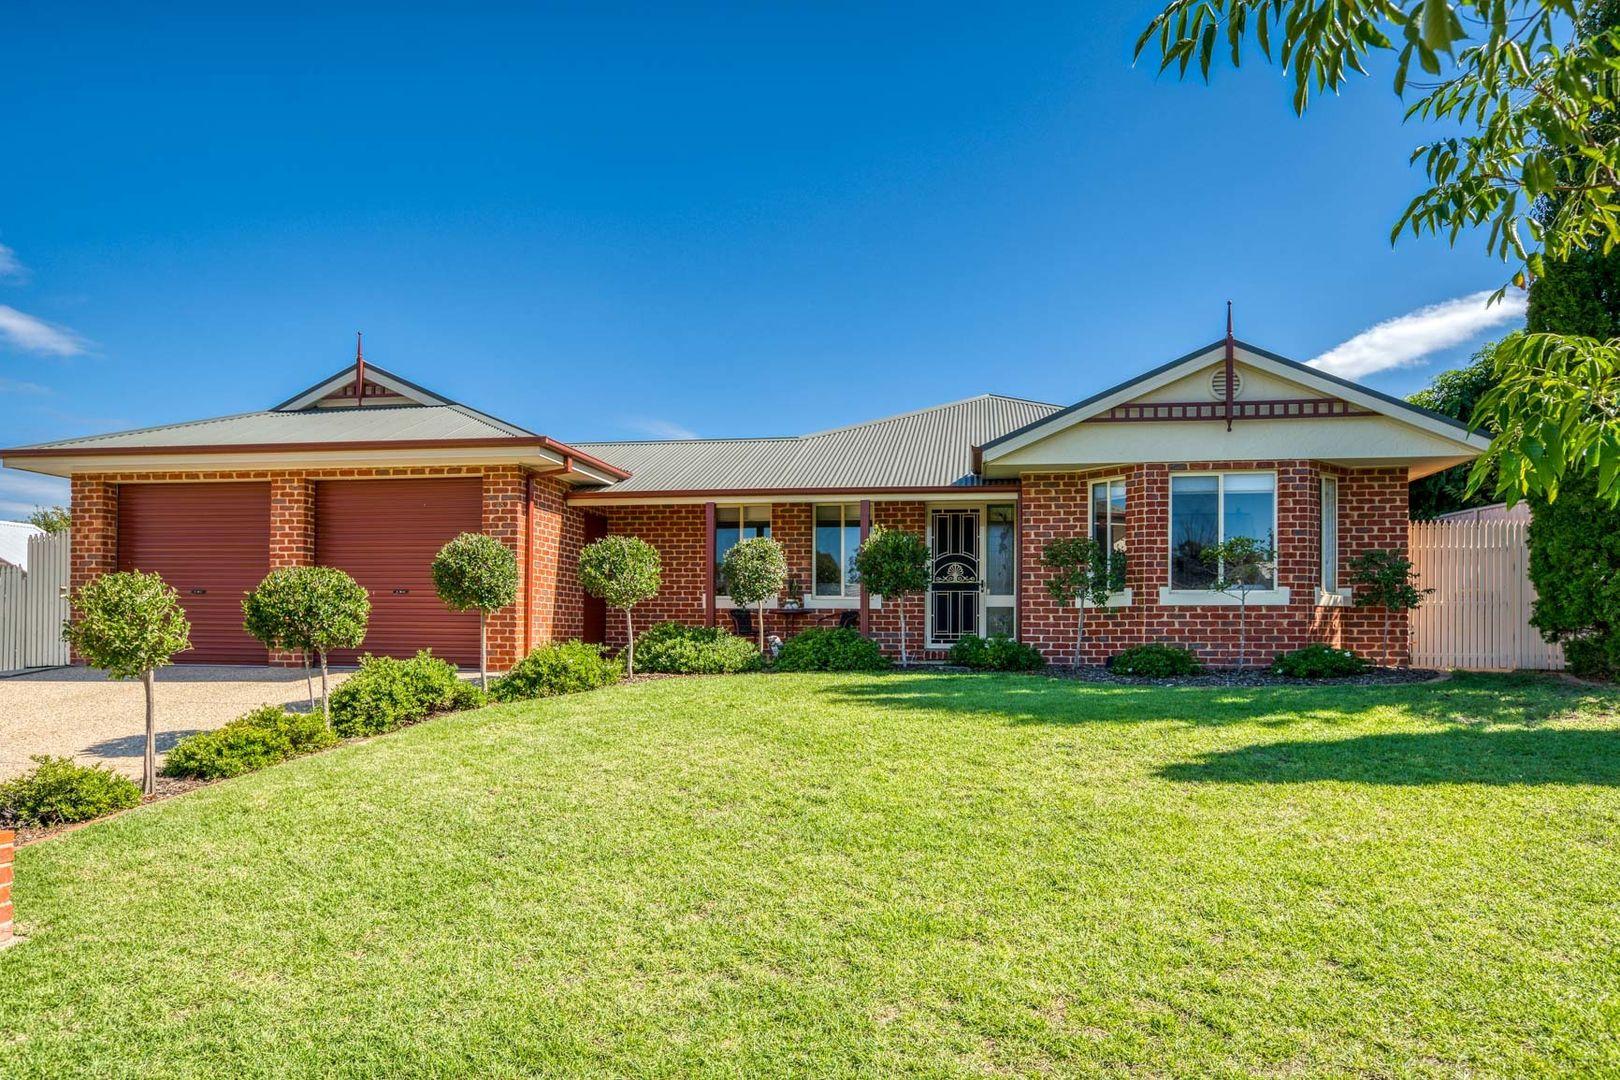 48 Norman Way, Thurgoona NSW 2640, Image 0